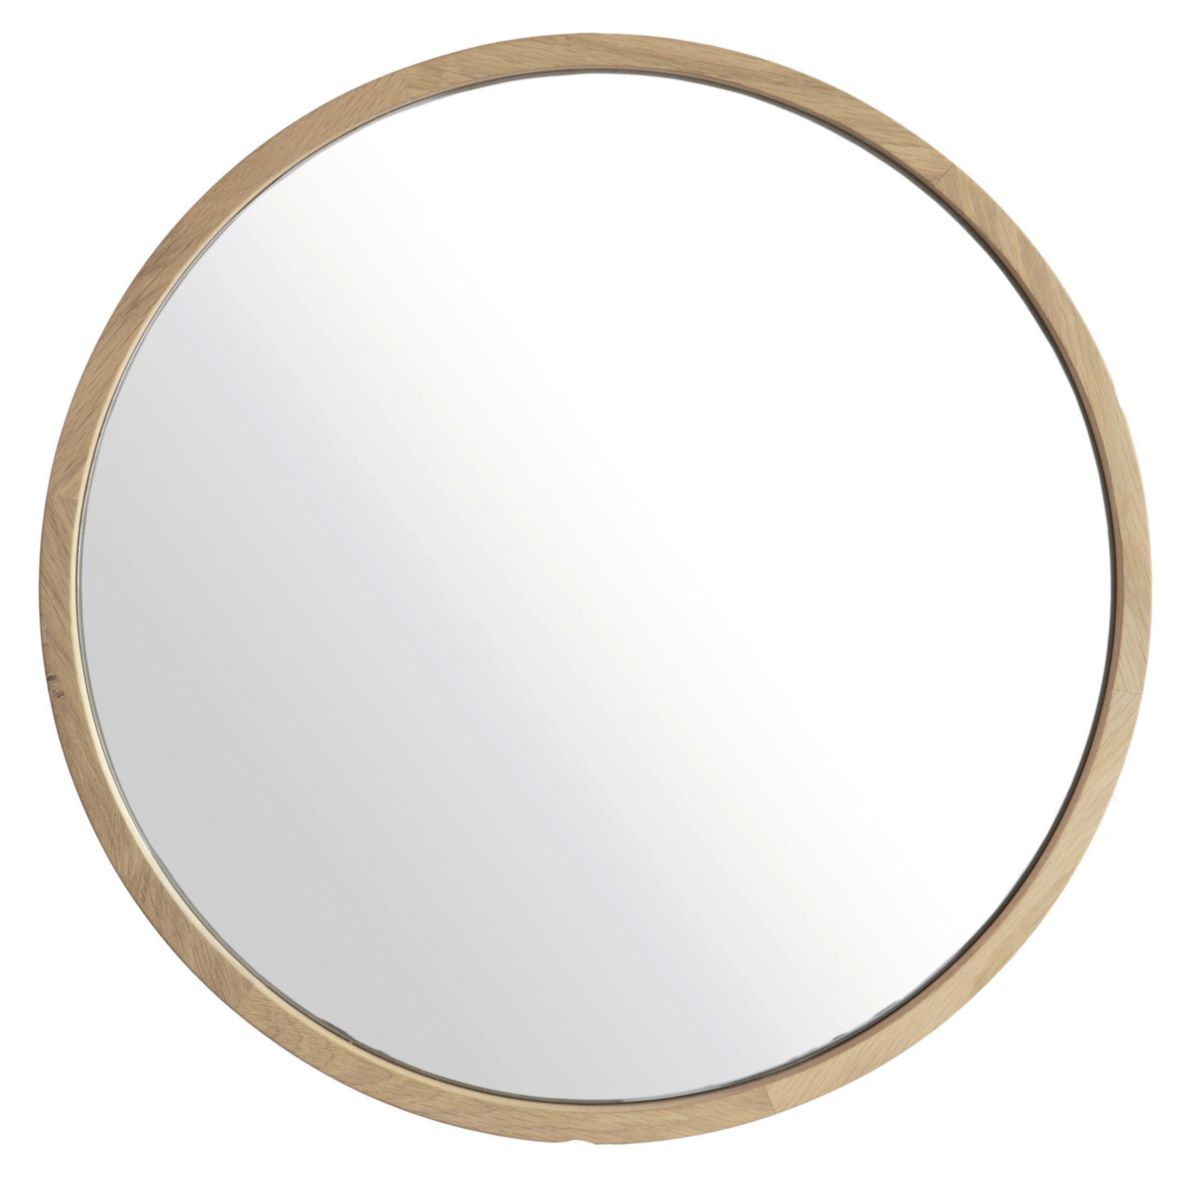 Line Art Miroir Rond Chene Diametre 120 Cm Ref 0139 Cedeo